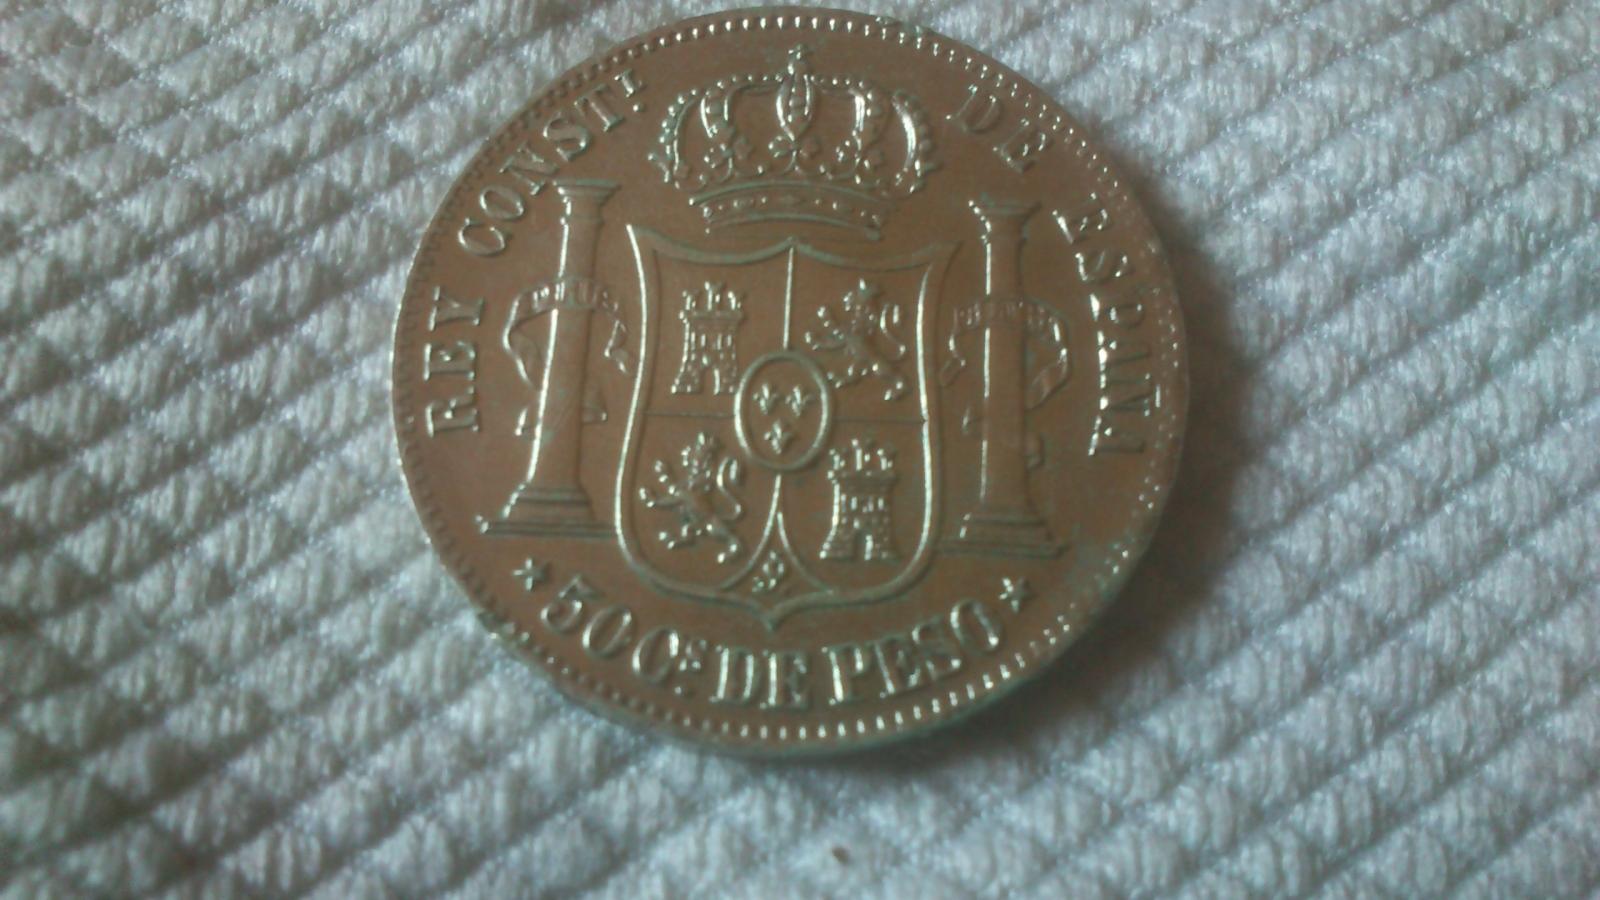 Monedas Españolas de las Filipinas 675jx5